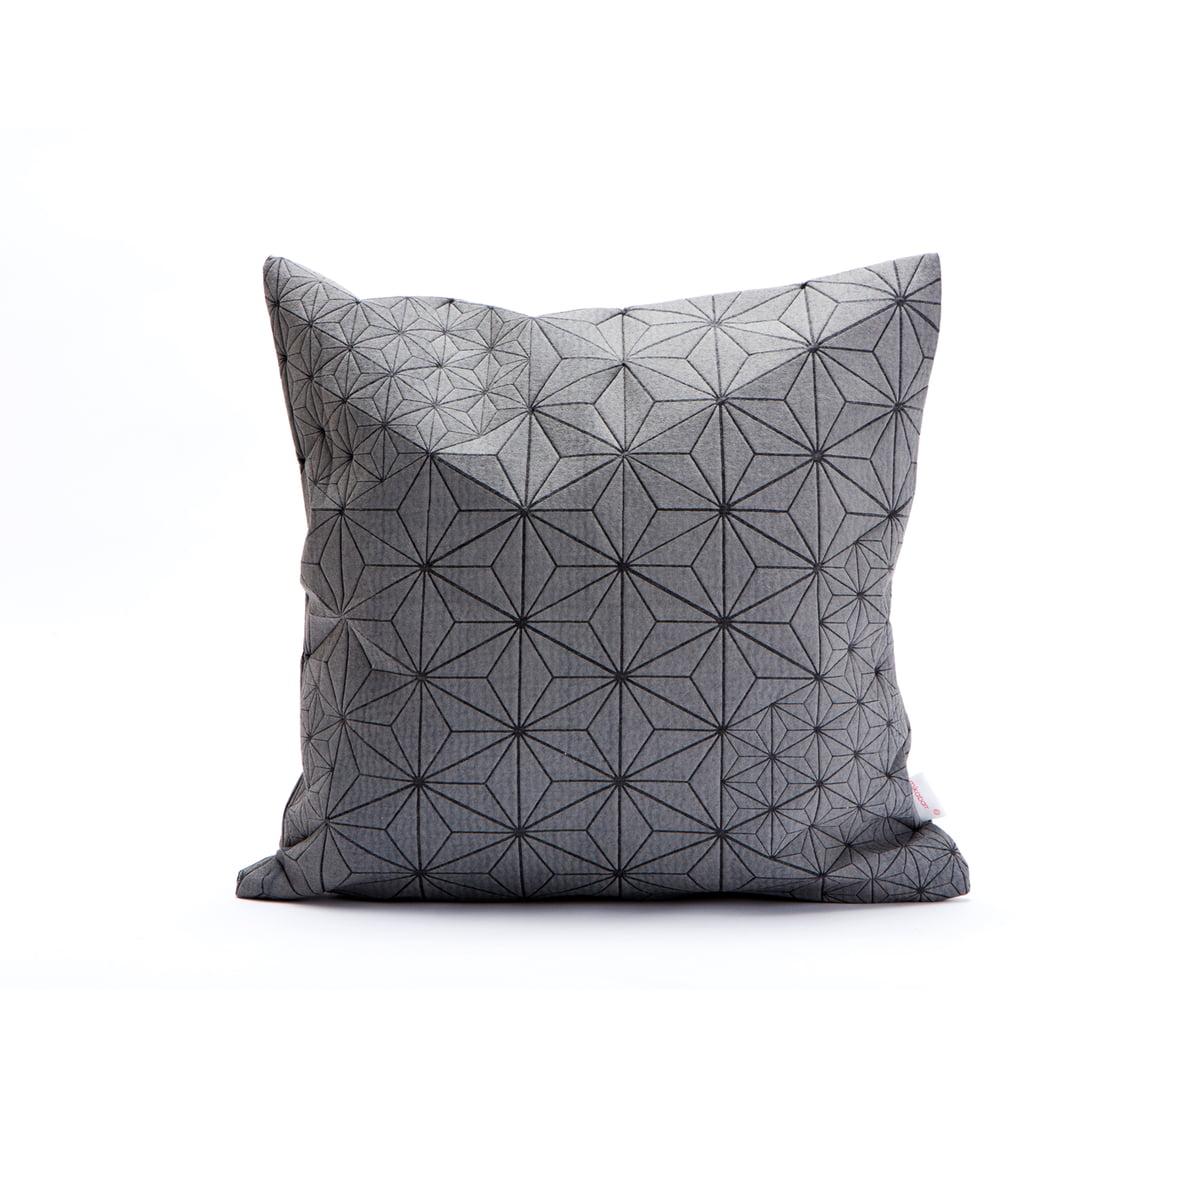 mika barr tamara kissenbezug 40 x 40 cm grau schwarz mehrfarbig t 0 h 40 b 40 online. Black Bedroom Furniture Sets. Home Design Ideas